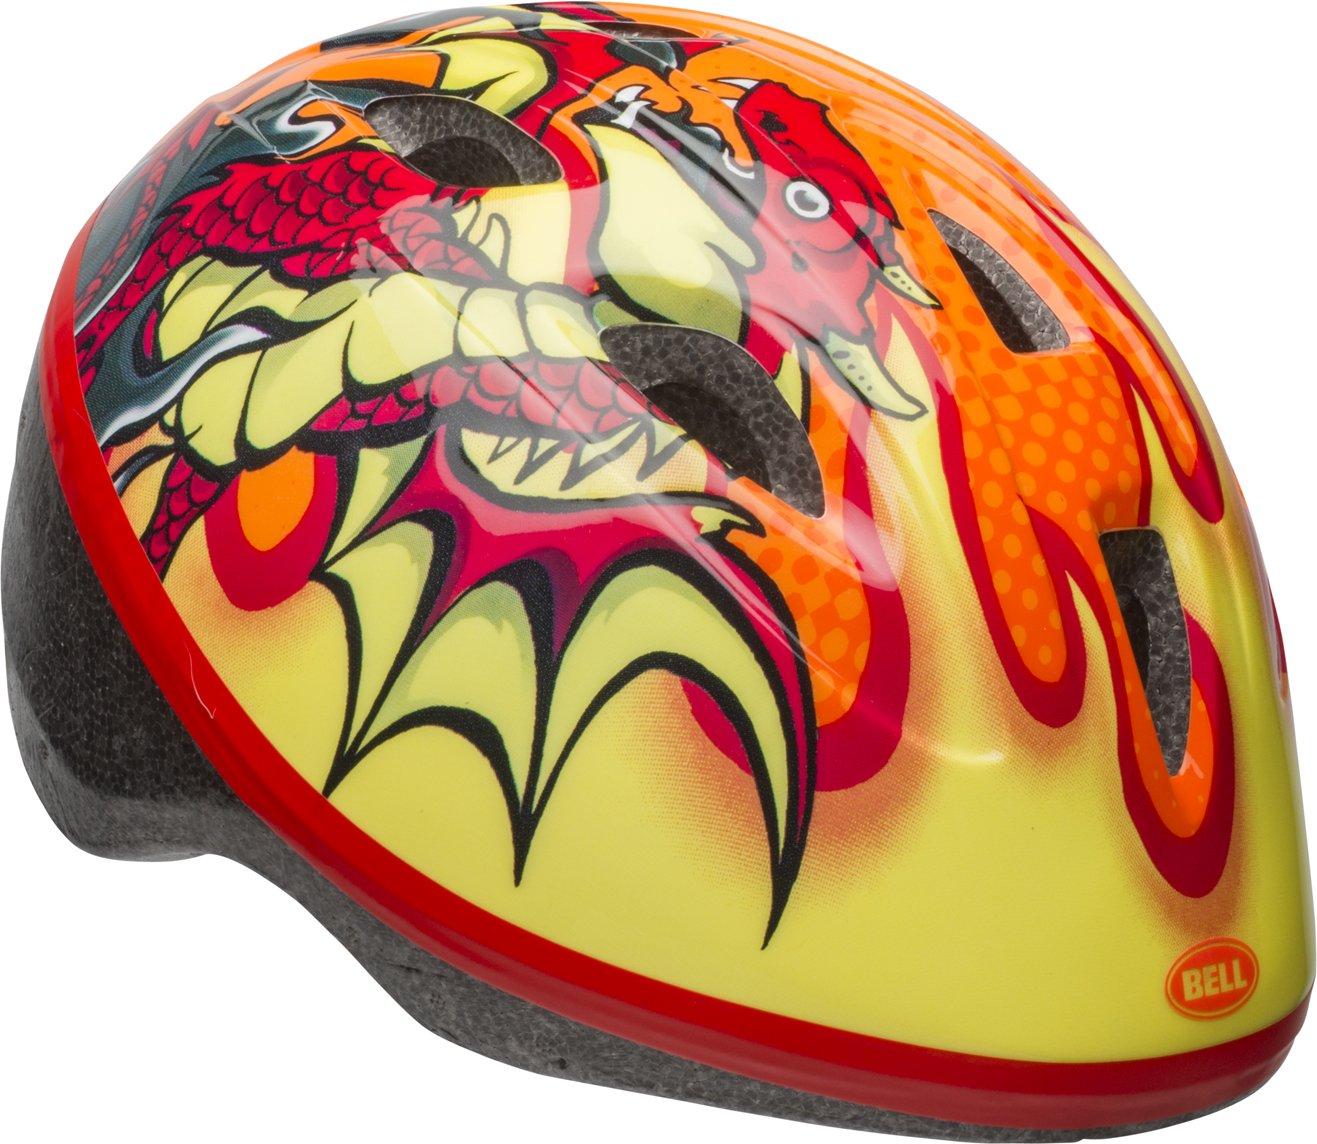 Bell 7084249 Infant Sprout Bike Helmet, Orange/Tang Drake